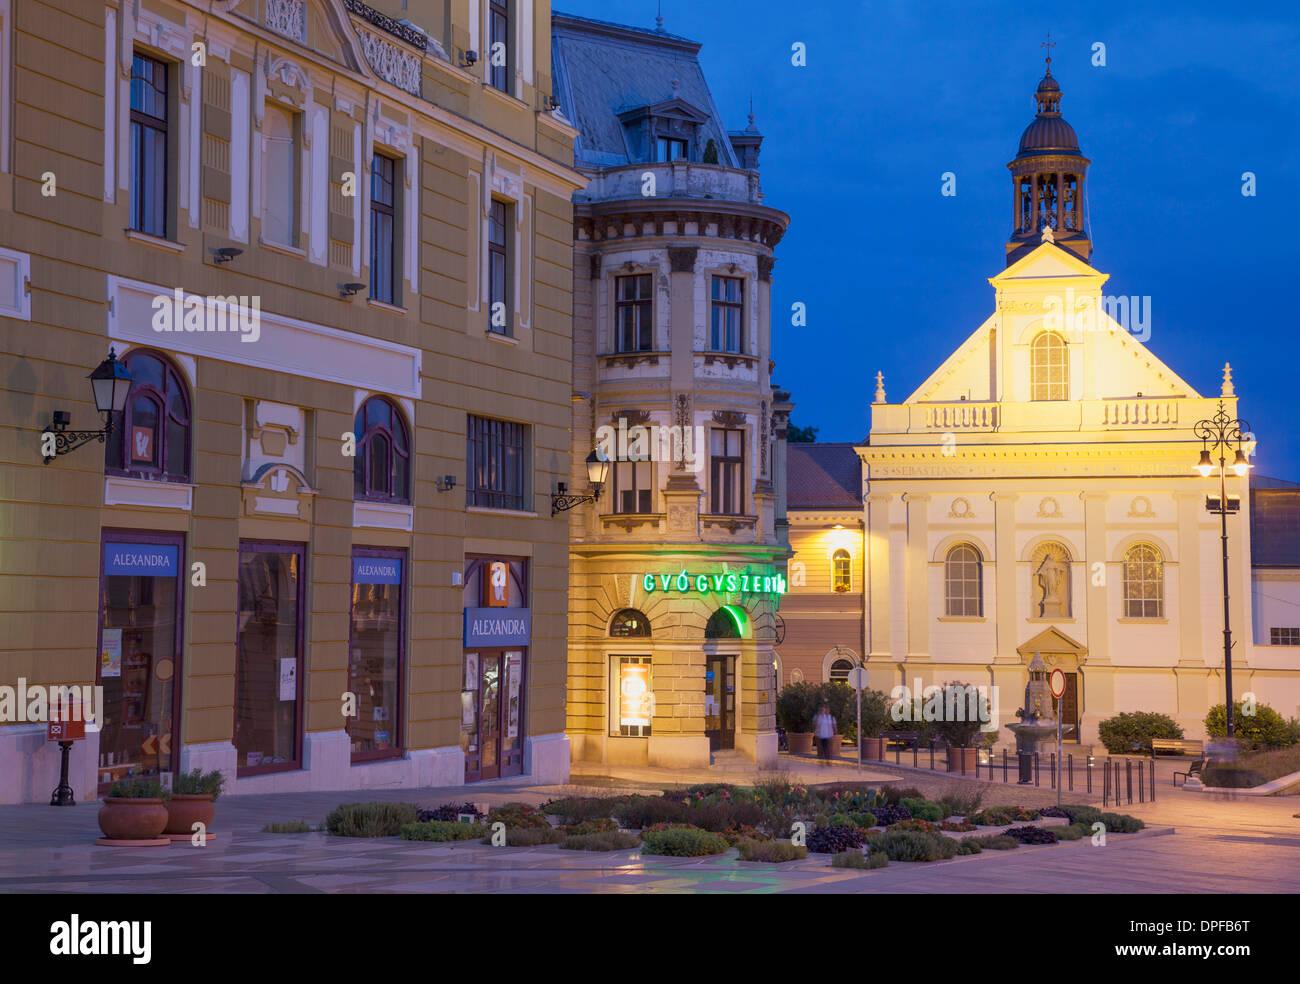 Church of the Good Samaritan, Pecs, Southern Transdanubia, Hungary, Europe - Stock Image